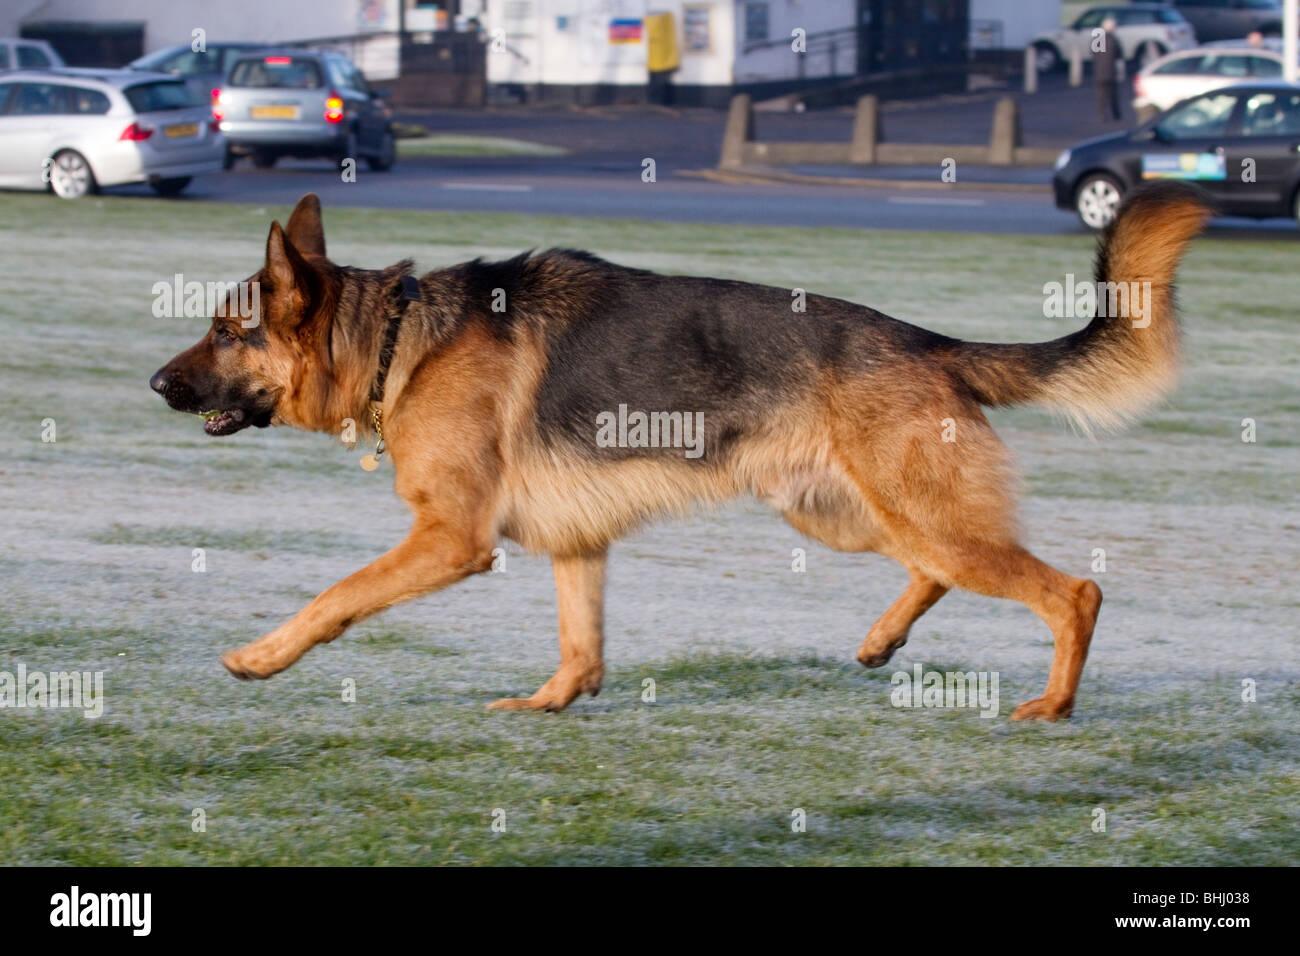 Alsatian dog running at a park; Lancashire - Stock Image